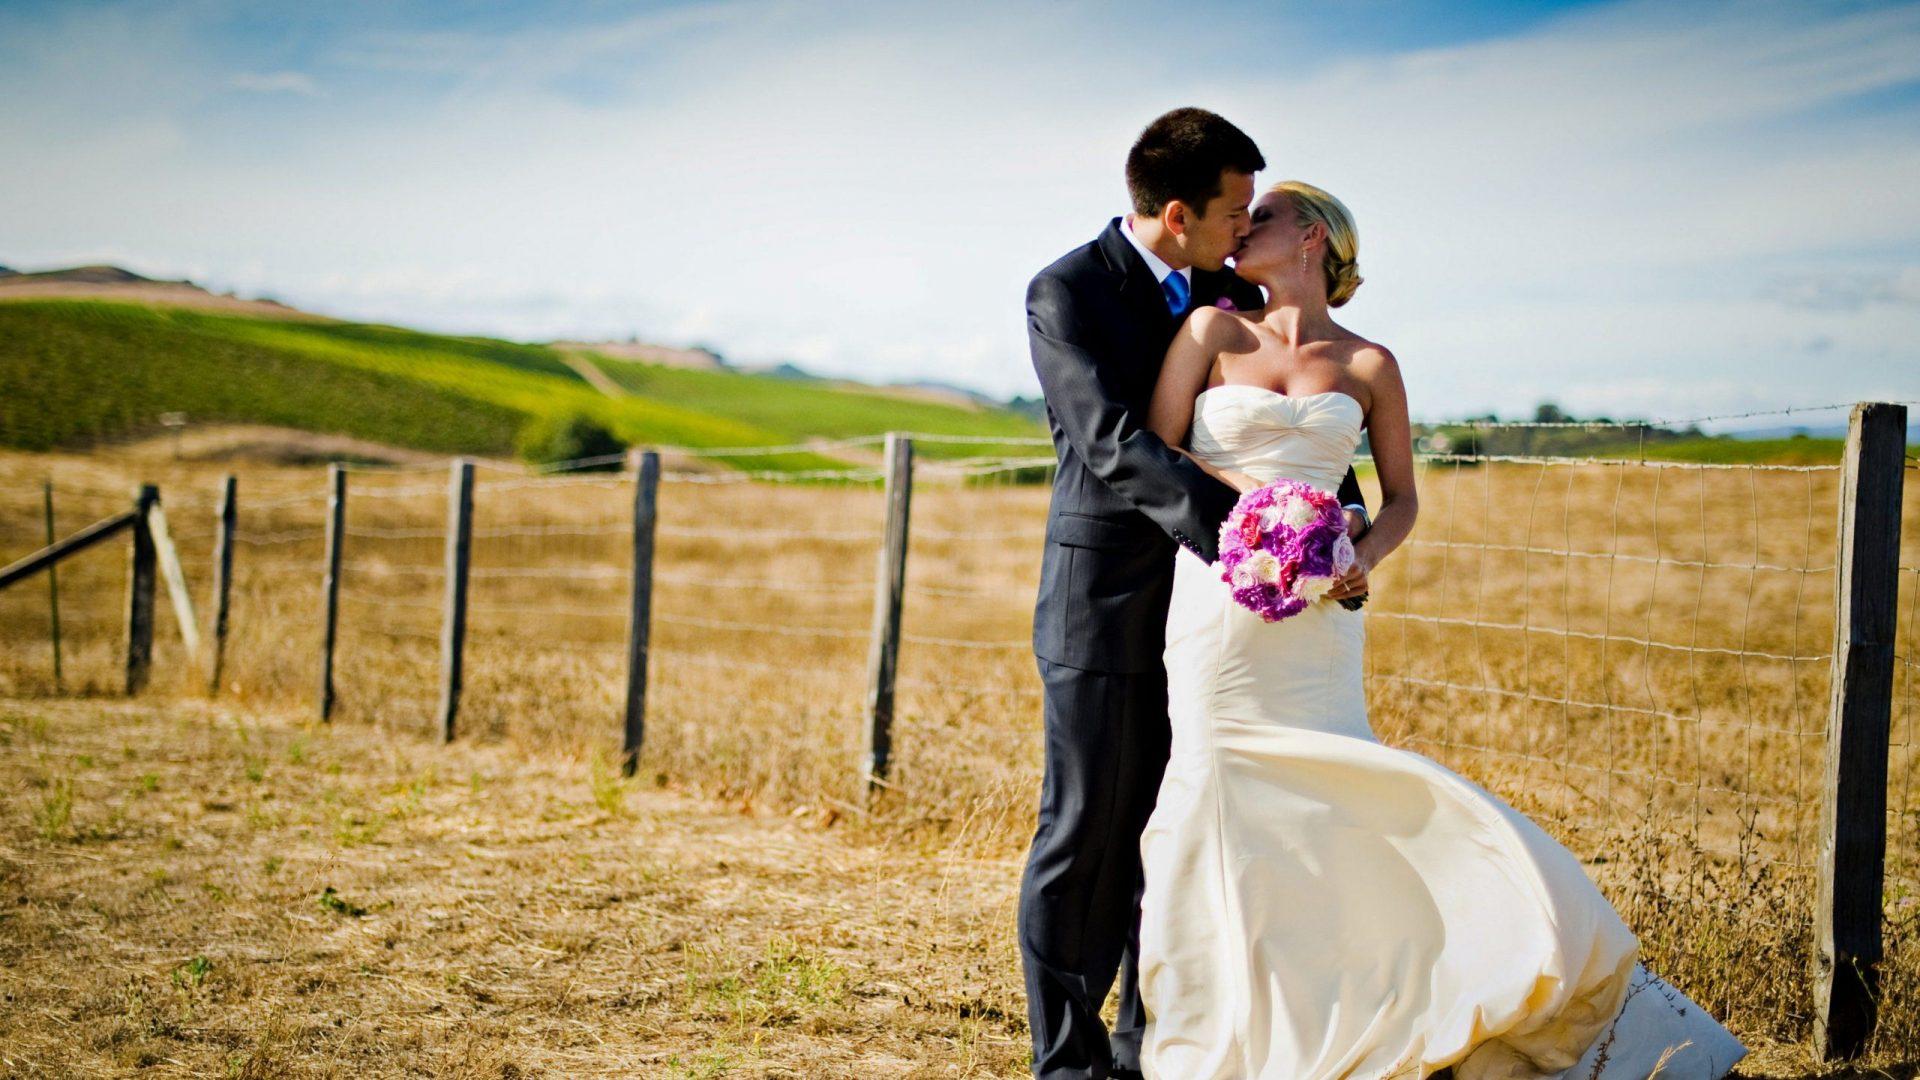 Hire a wedding photographer to capture wedding shots